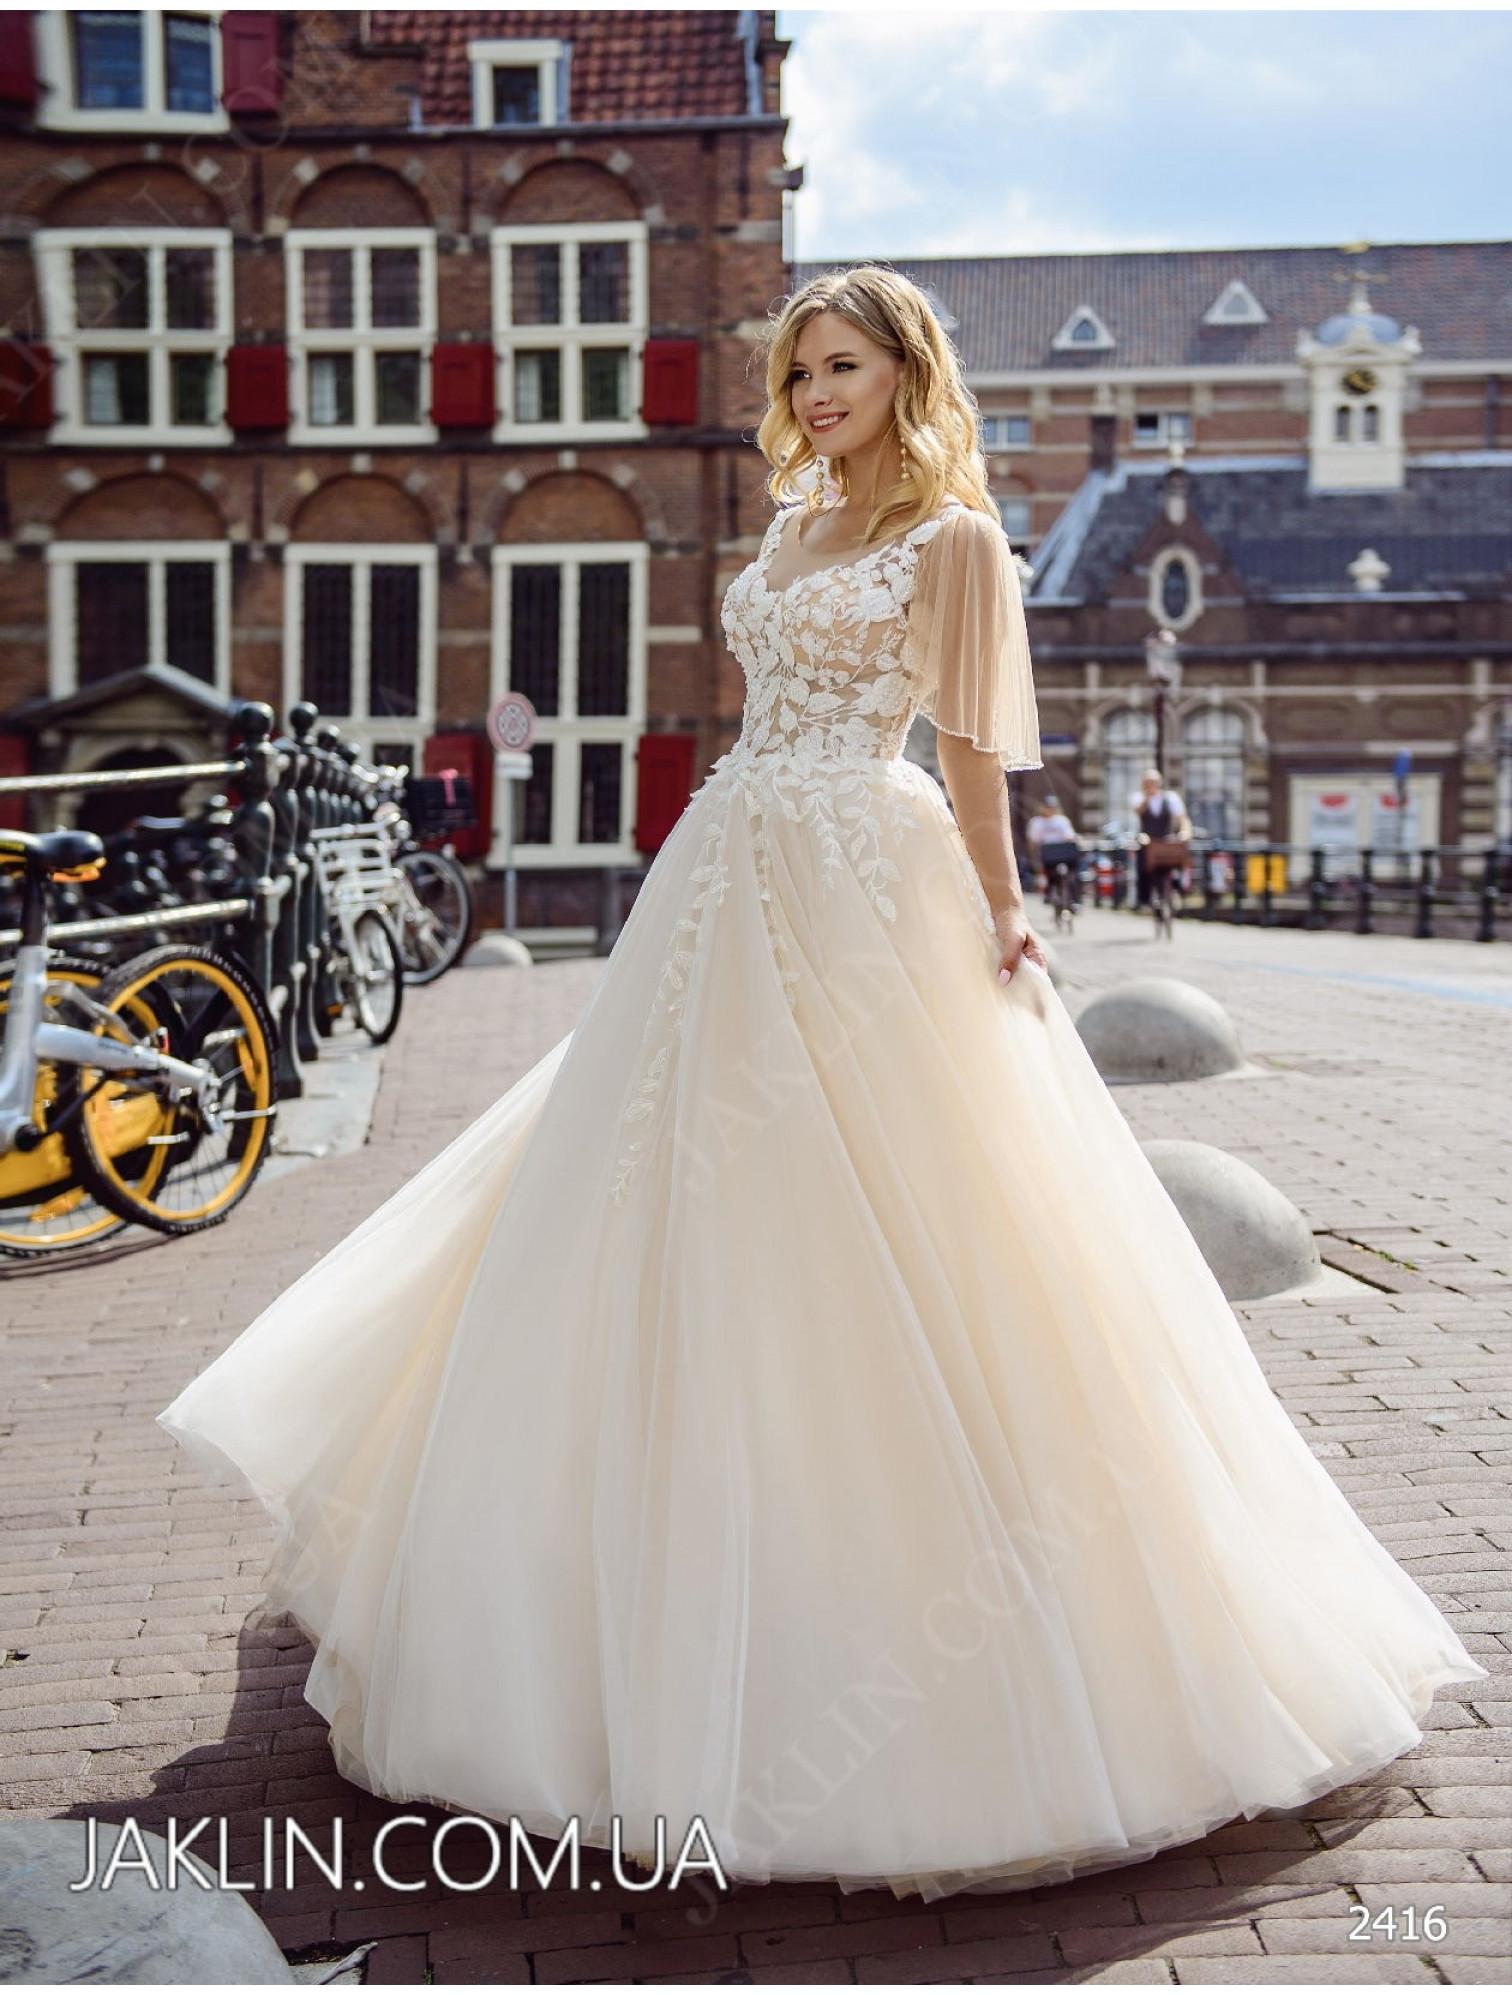 Wedding dress 2416